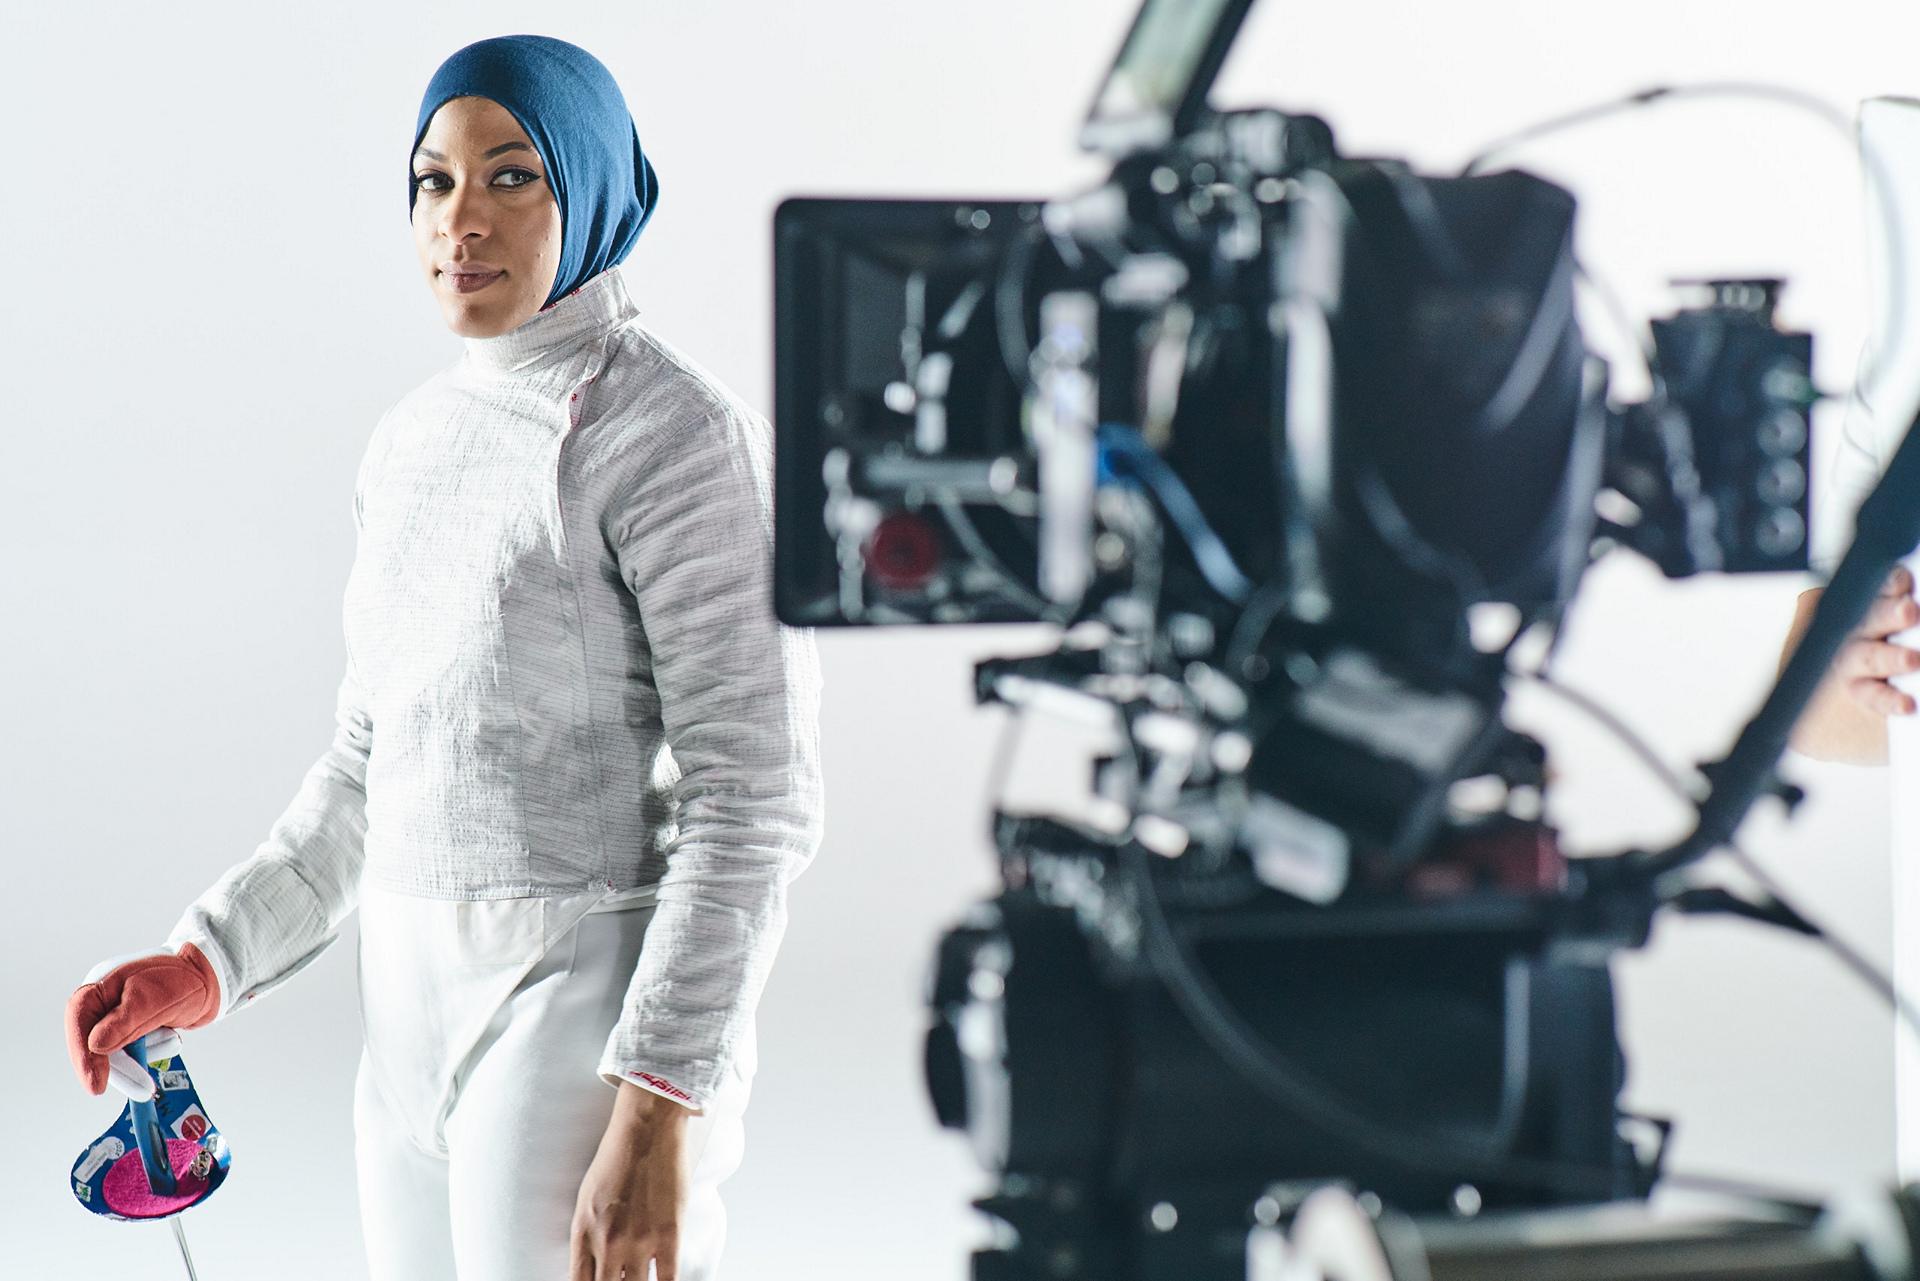 Ibtihaj Muhammad behind the scenes at the MINI 2016 Olympics commercial shoot © BMW AG